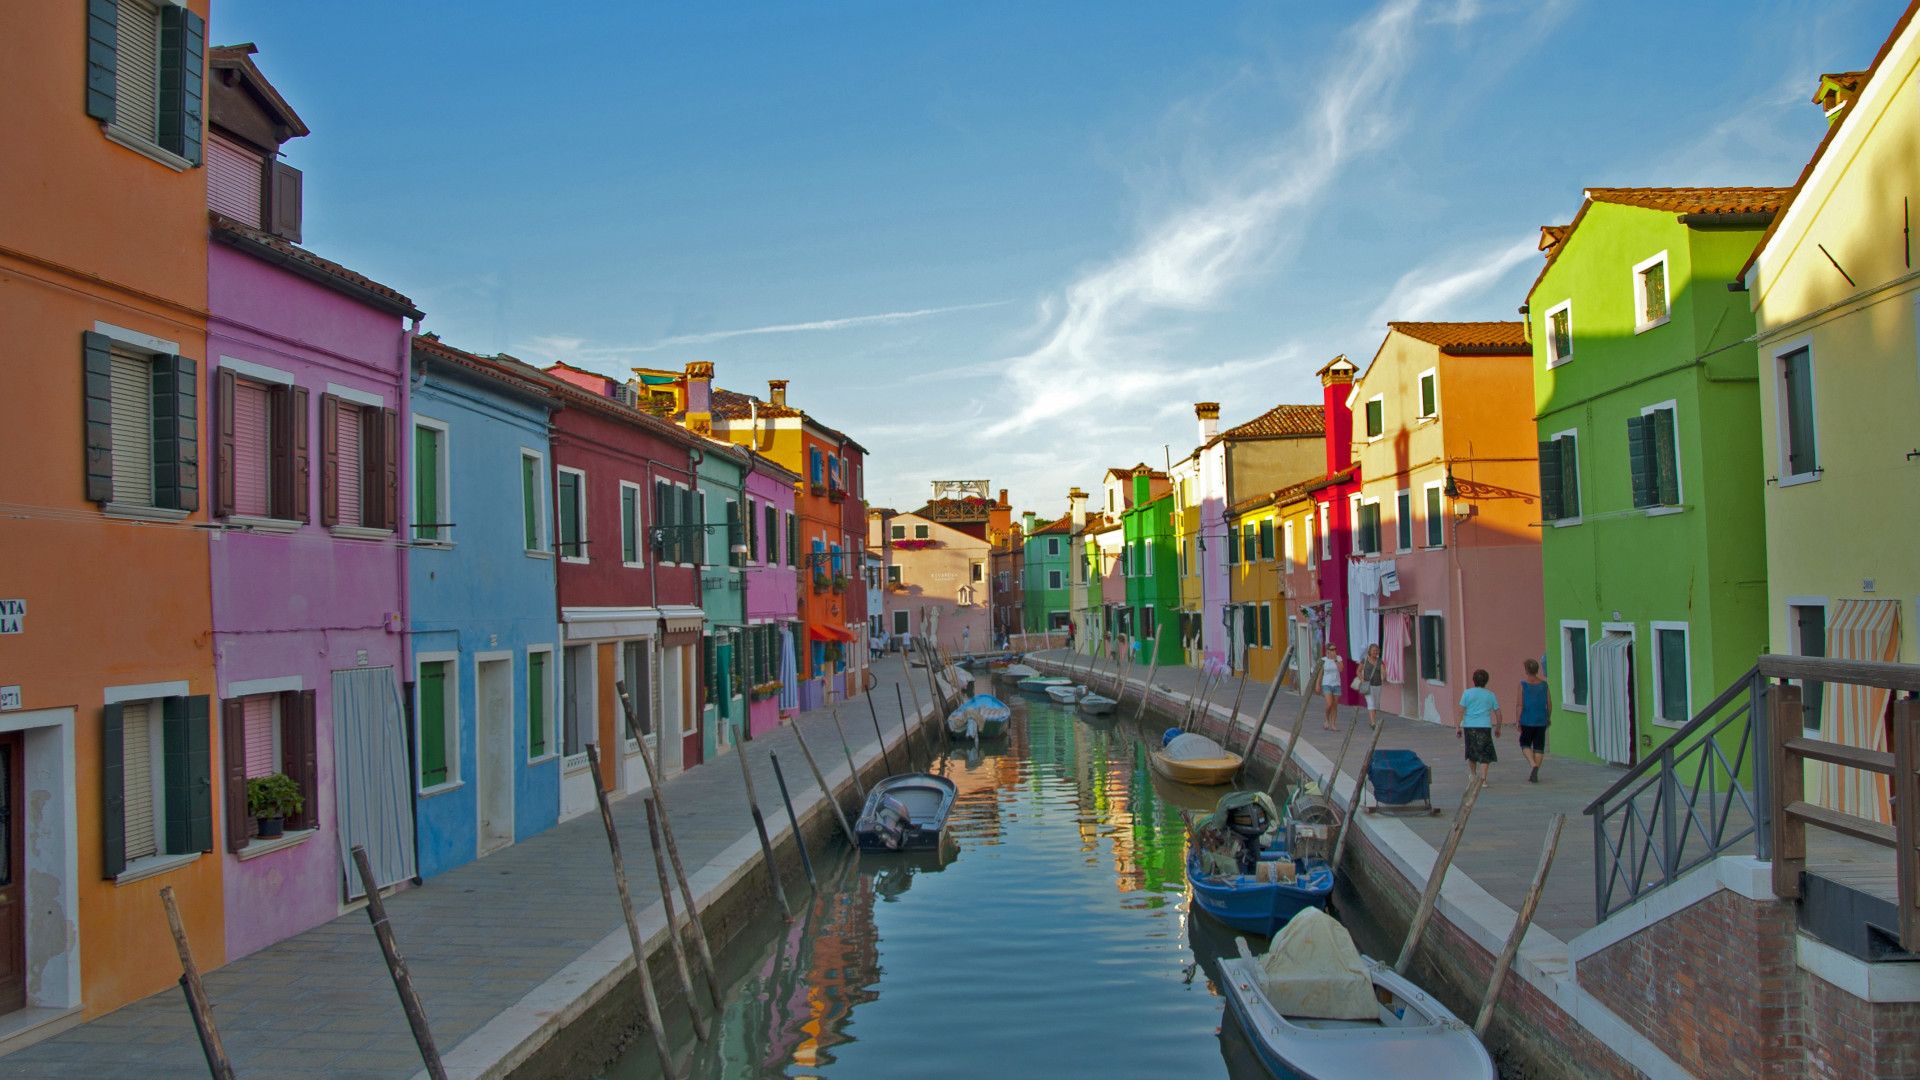 Houses in Burano, Venice Lagoon, Italy